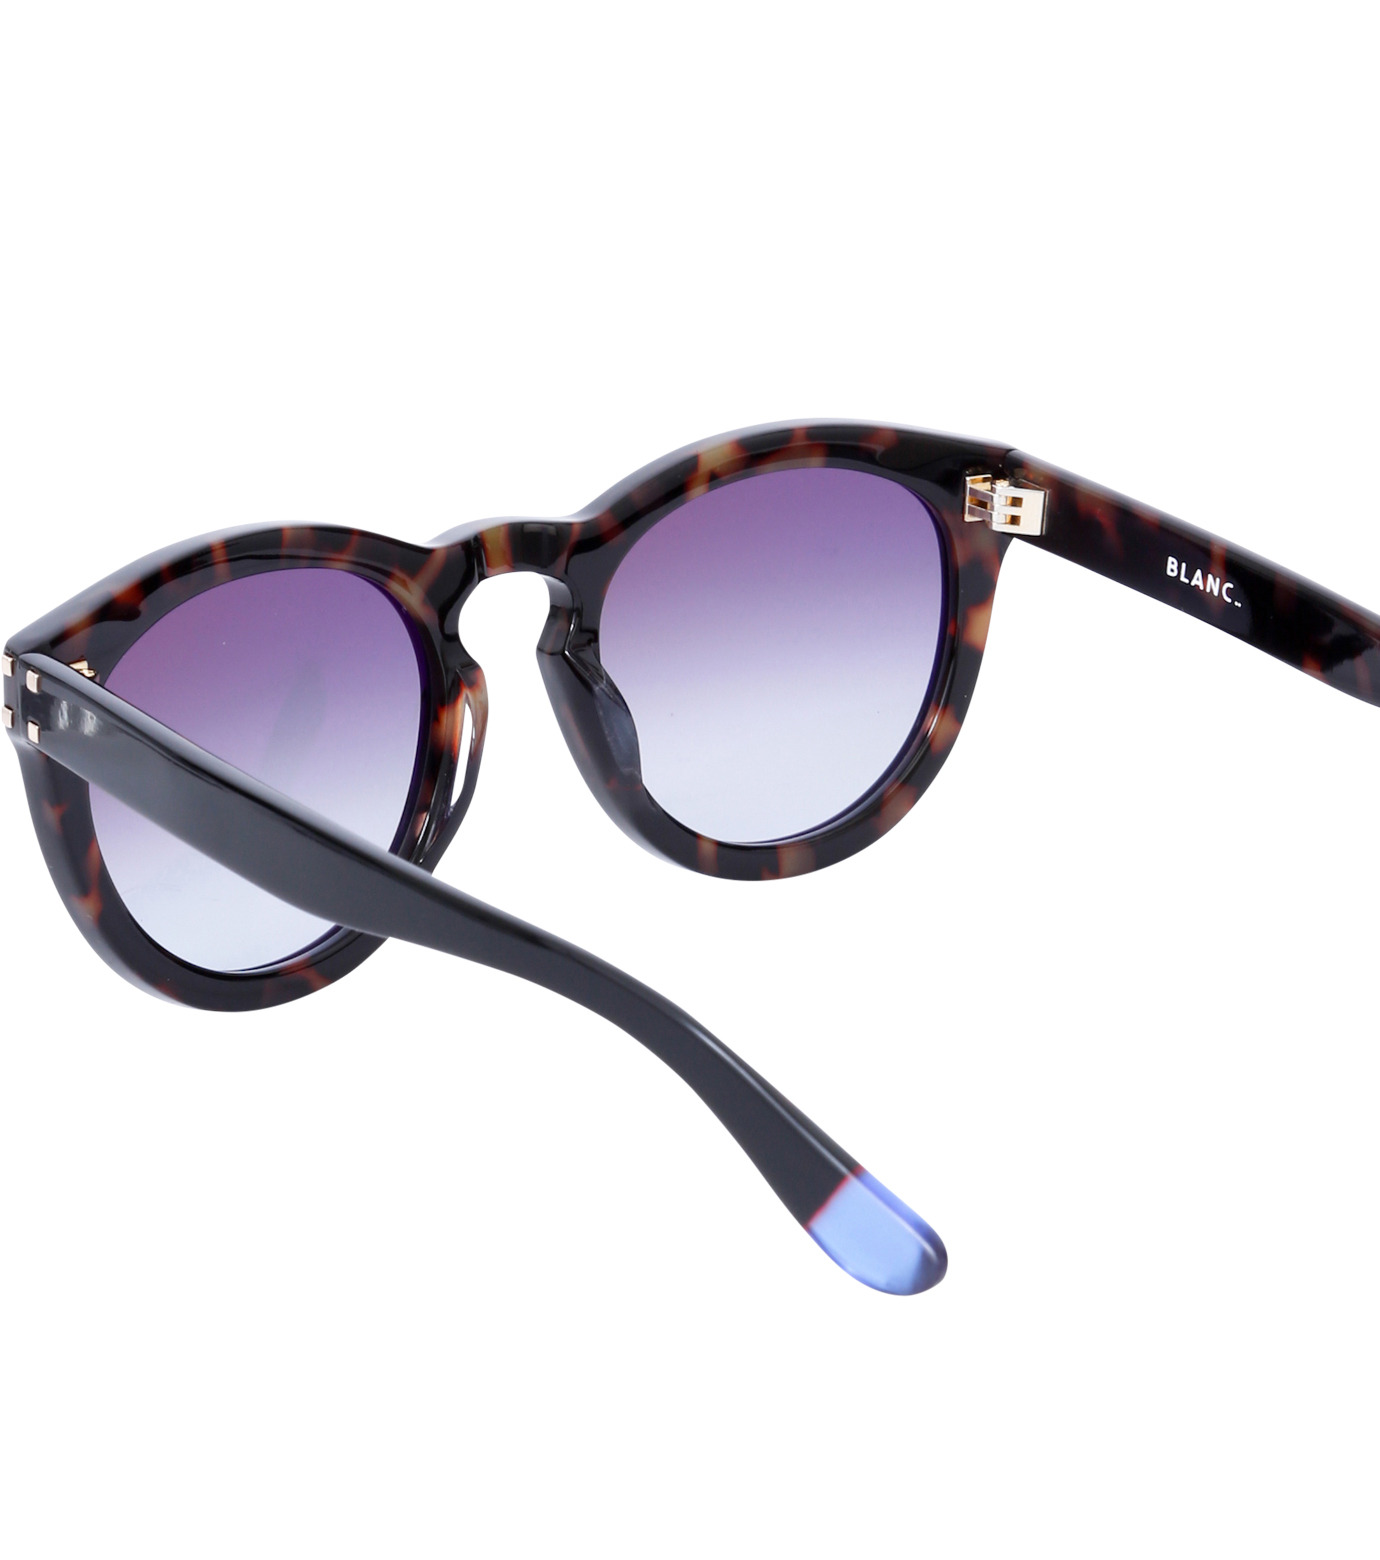 BLANC(ブラン)のThick Frame Sunglass-BLACK(アイウェア/eyewear)-B0007-N-13 拡大詳細画像4